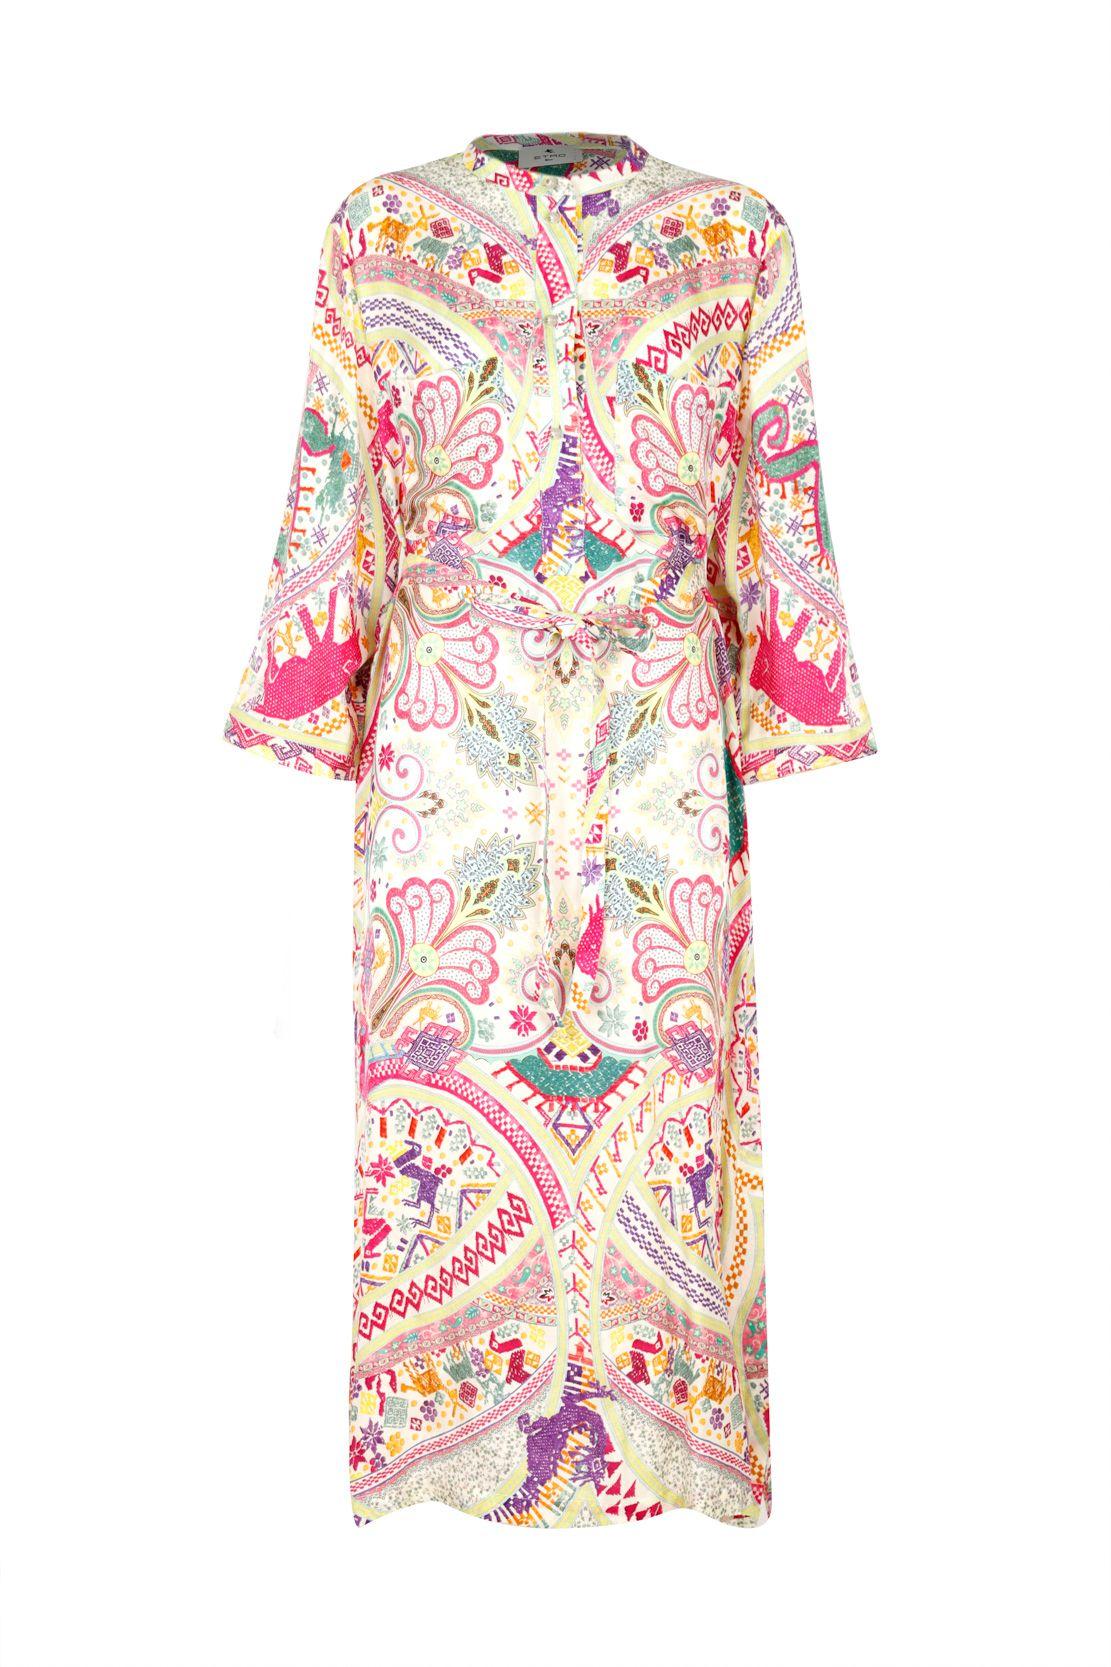 Etro Silks ETRO WOMEN'S MULTICOLOR VISCOSE DRESS